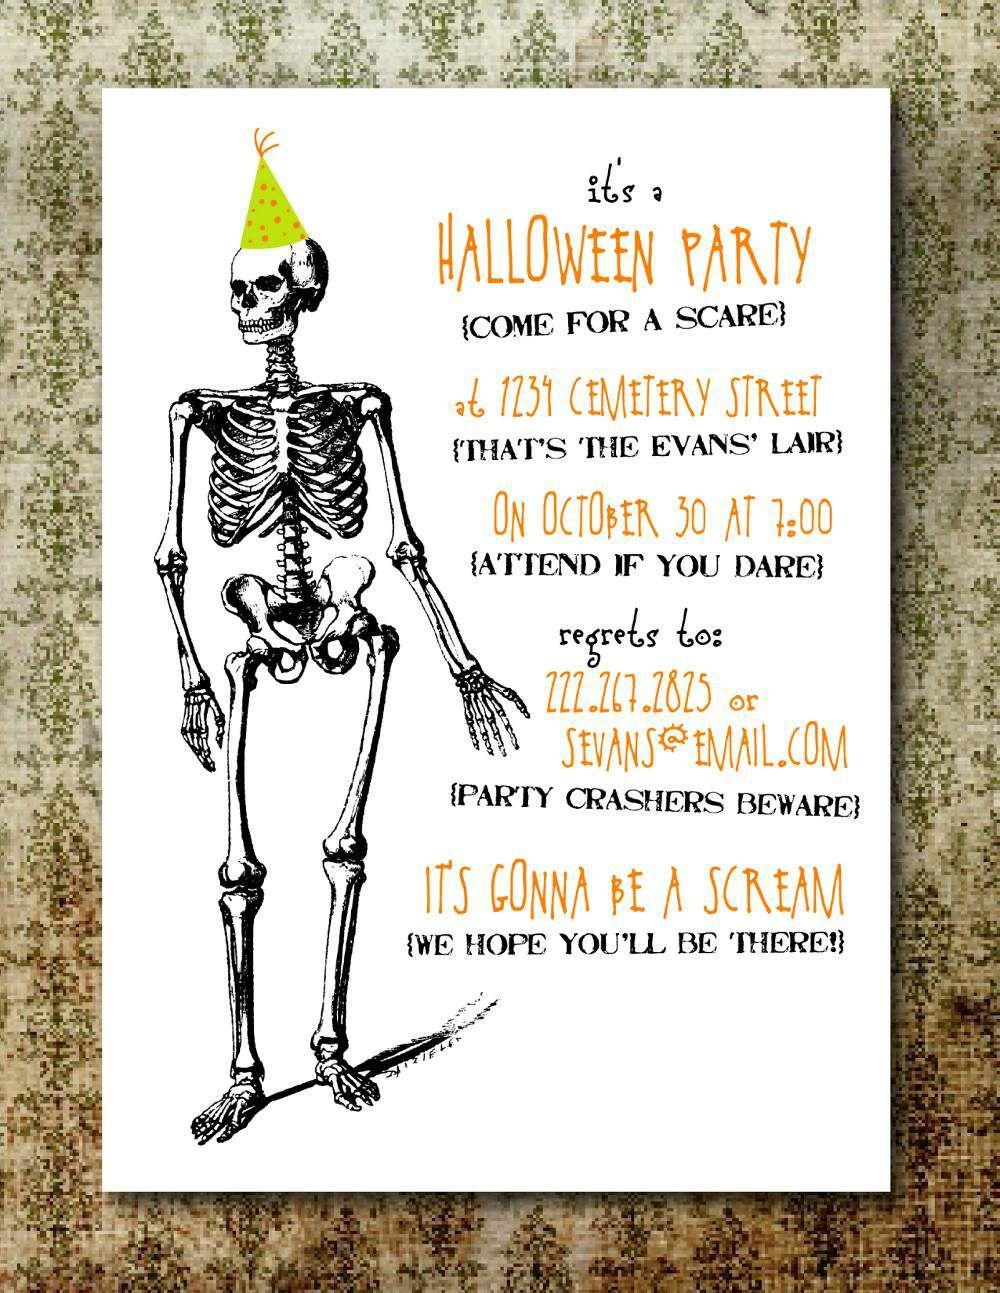 005 Rare Free Halloween Invitation Template Highest Clarity  Templates Microsoft Word Wedding Printable PartyFull